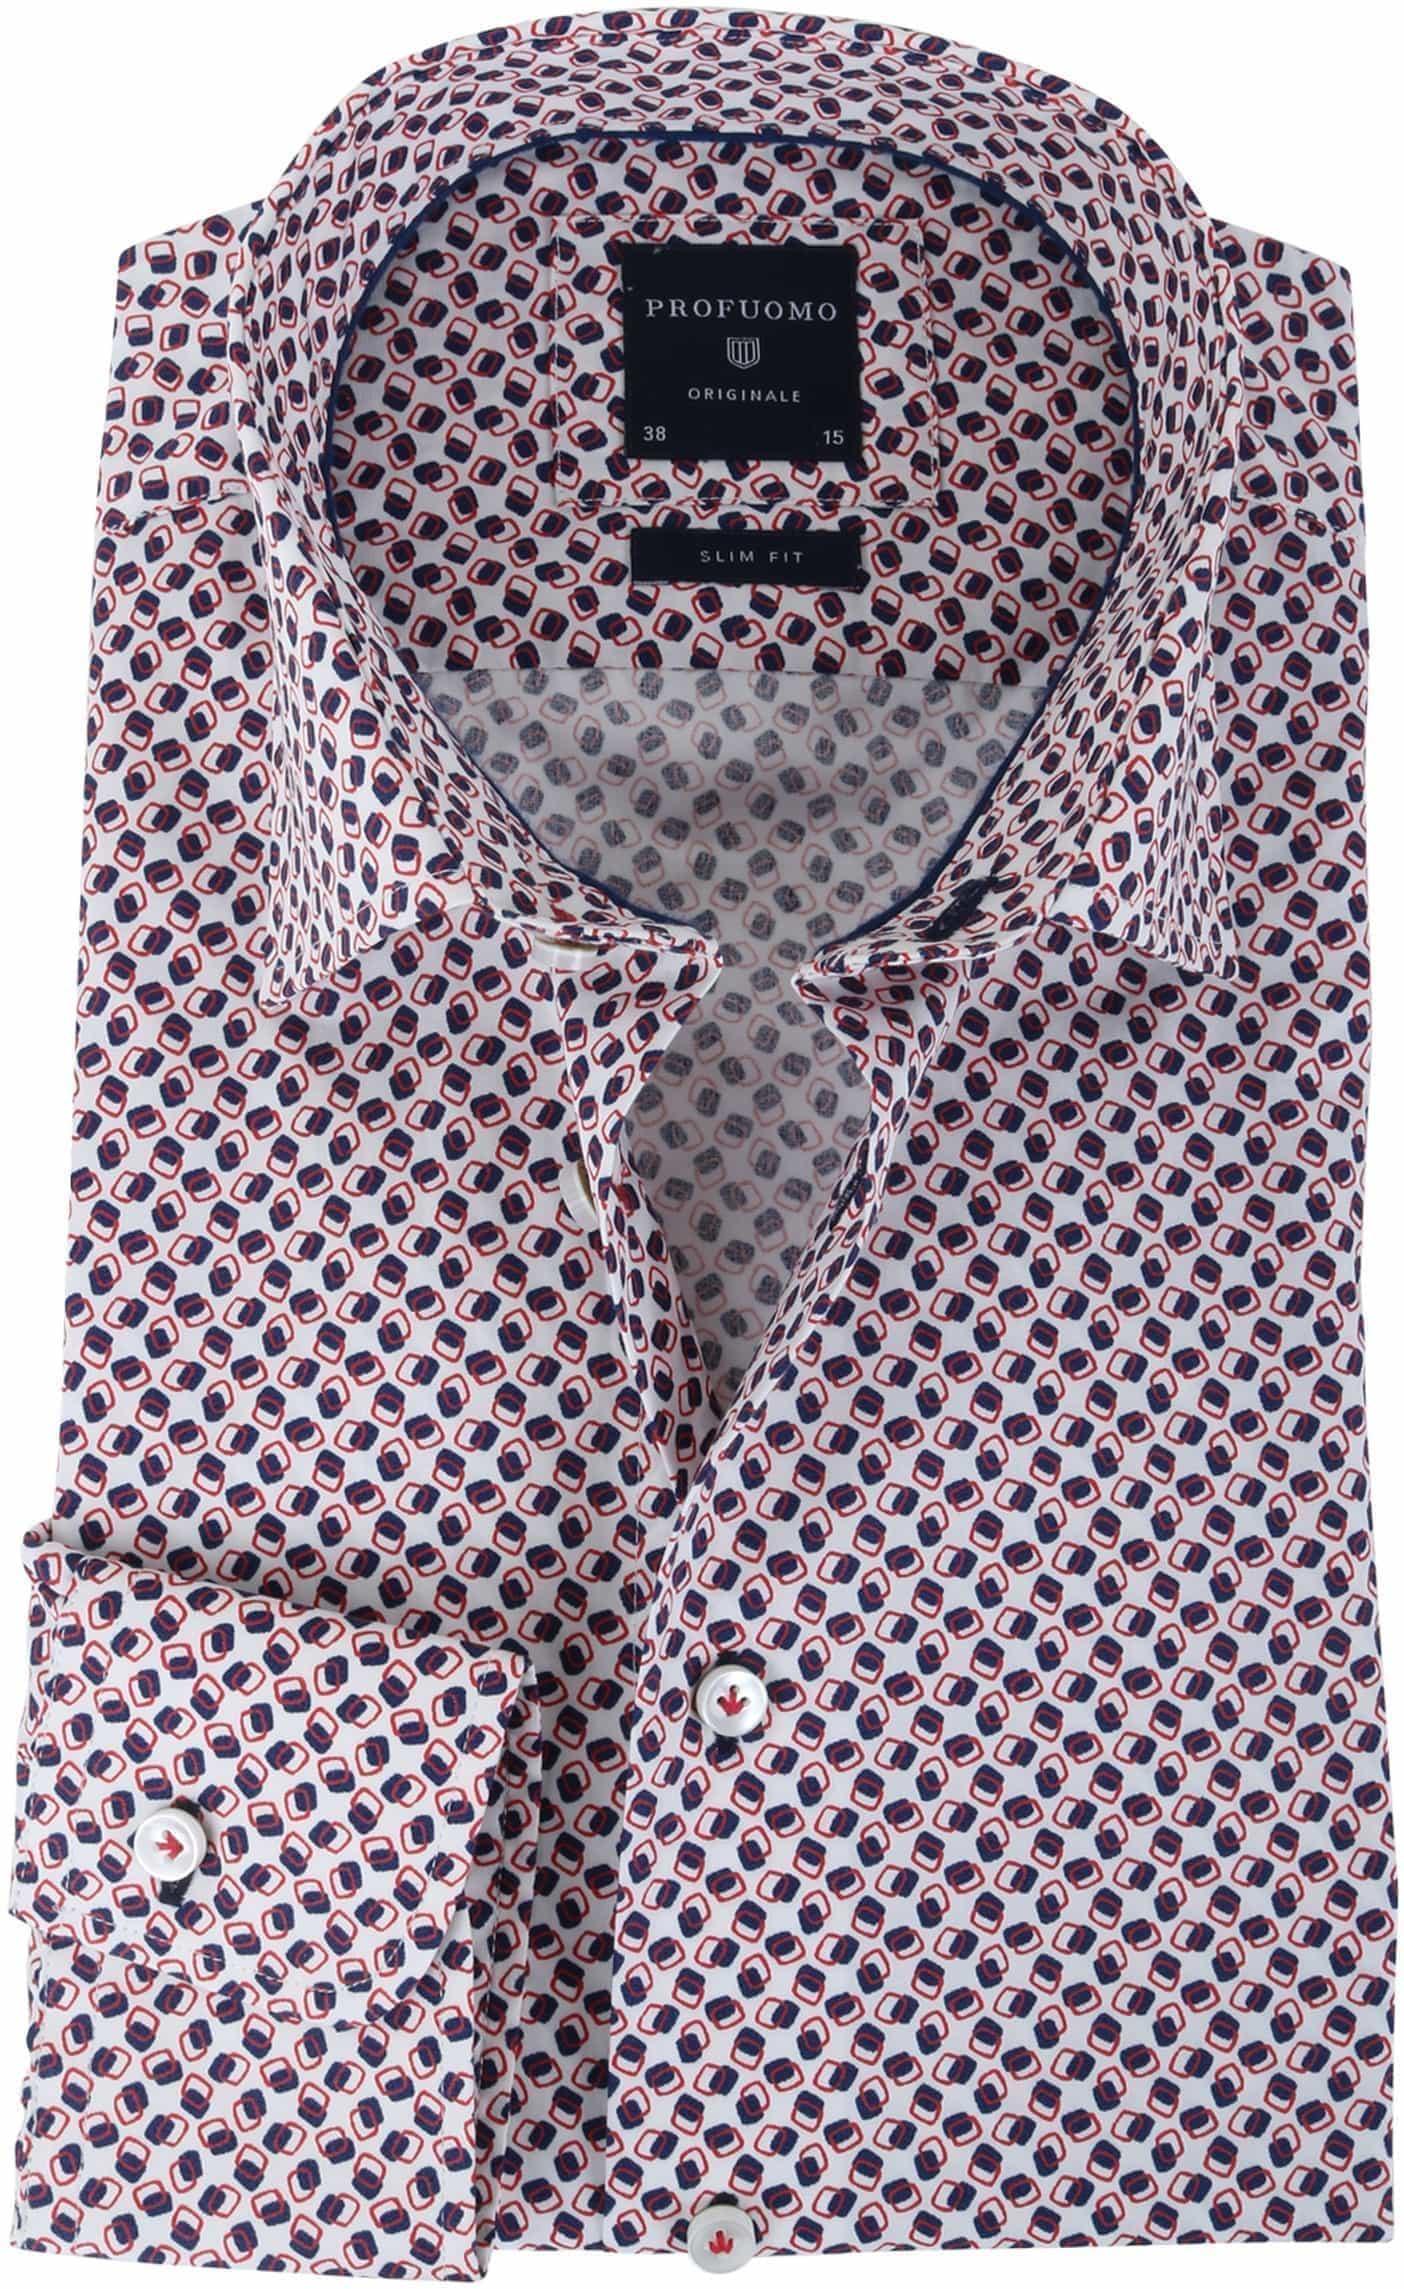 Rode Overhemd.Profuomo Overhemd Rode Print Ppoh1a1065 Online Bestellen Suitable